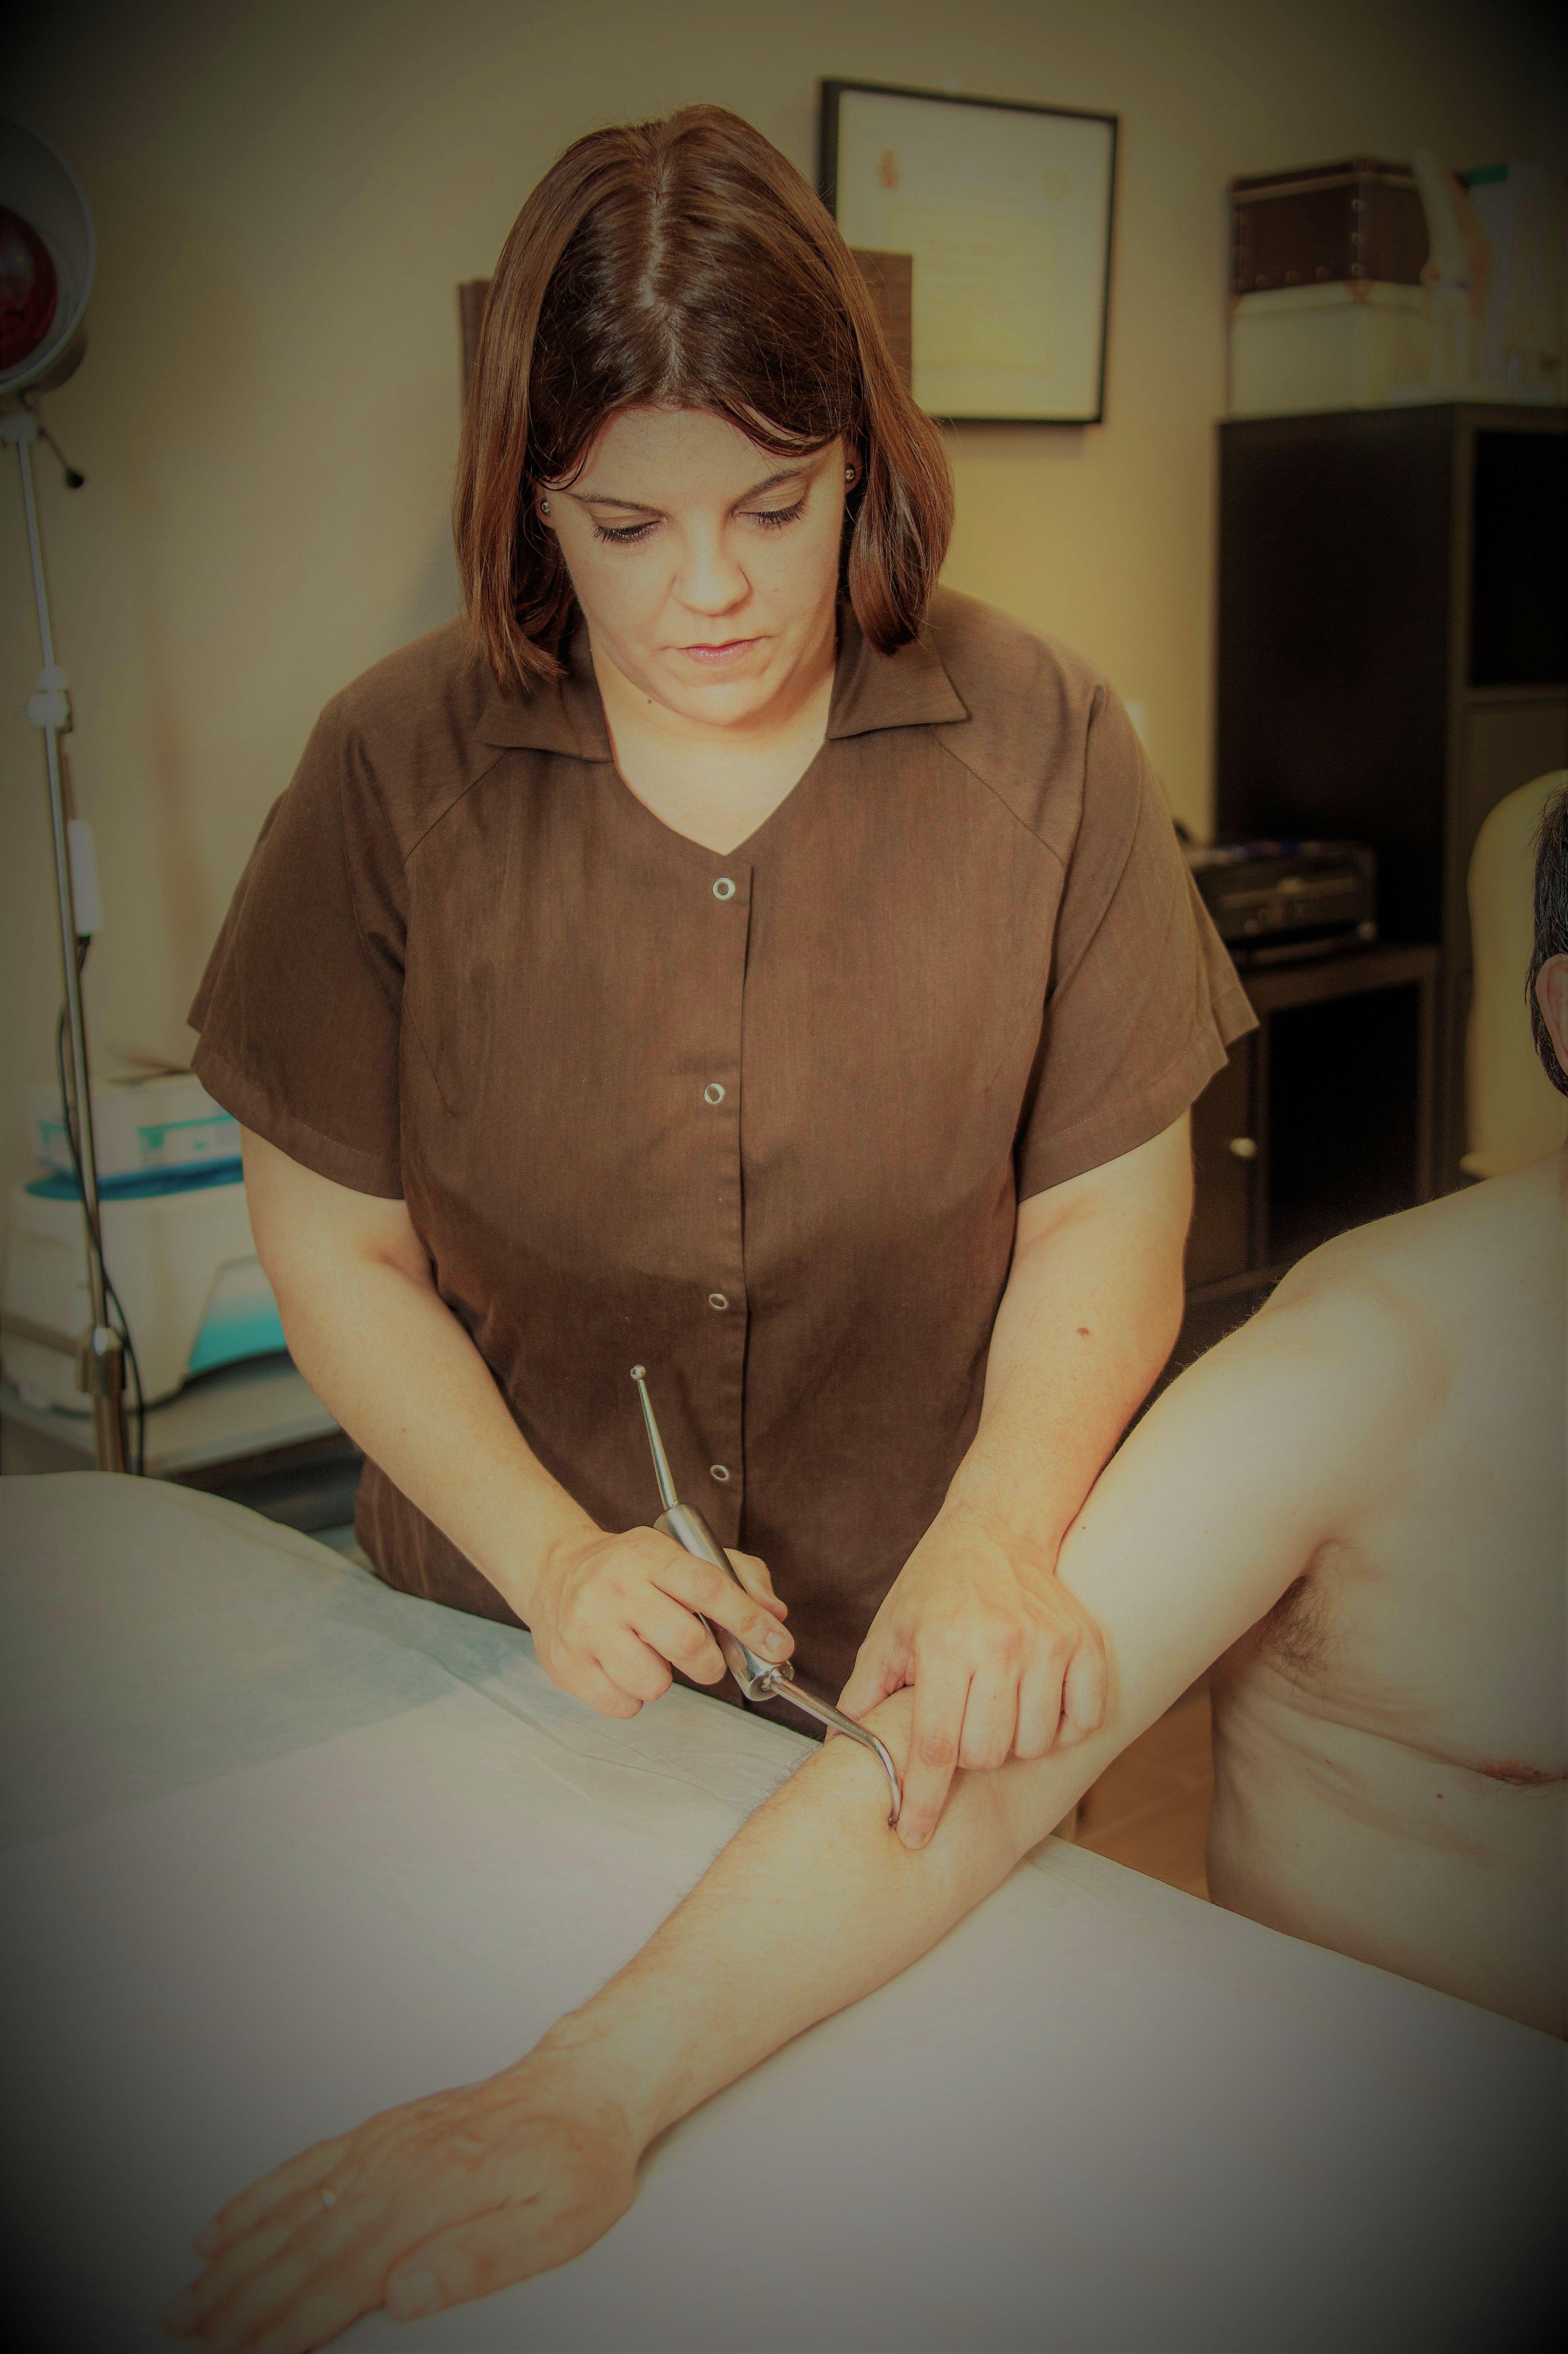 Foto 7 de Fisioterapia y osteopatía preventiva en San Pedro Alcántara | Osteophysix